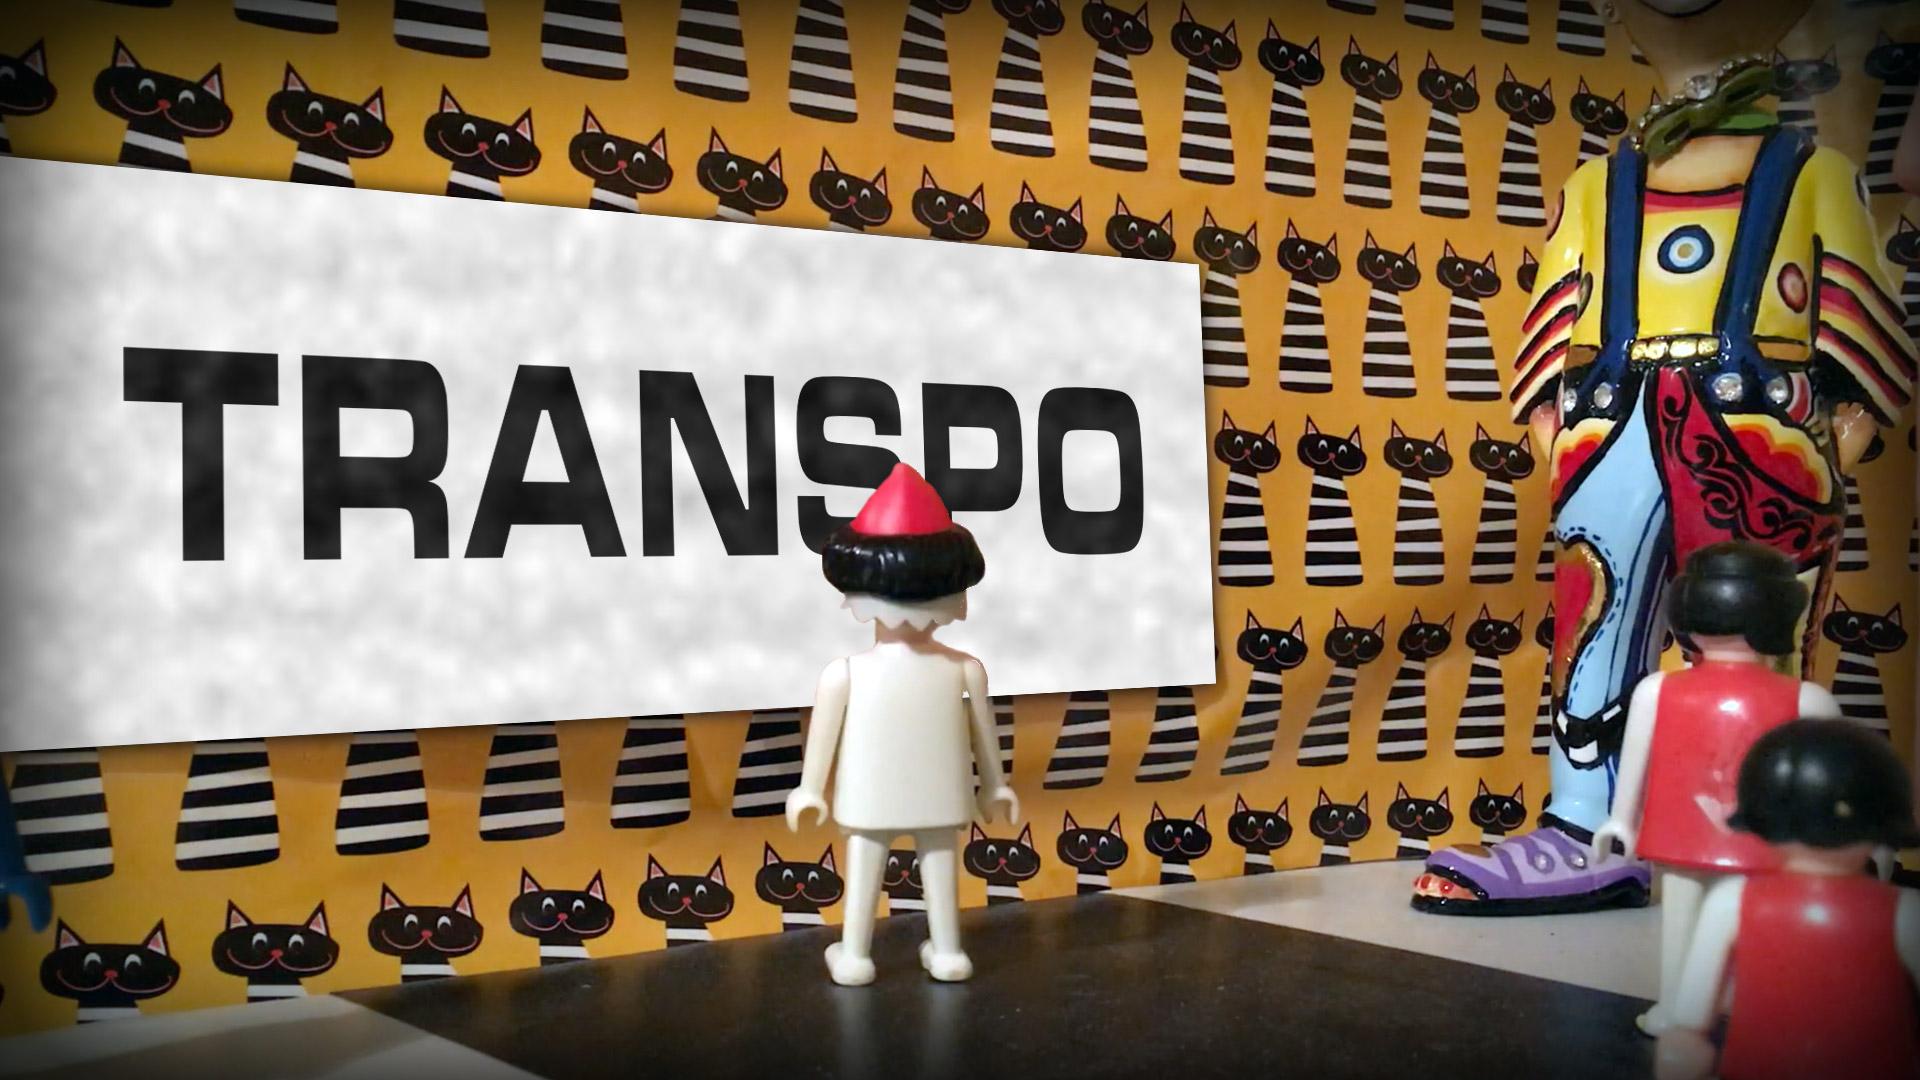 Transpo One